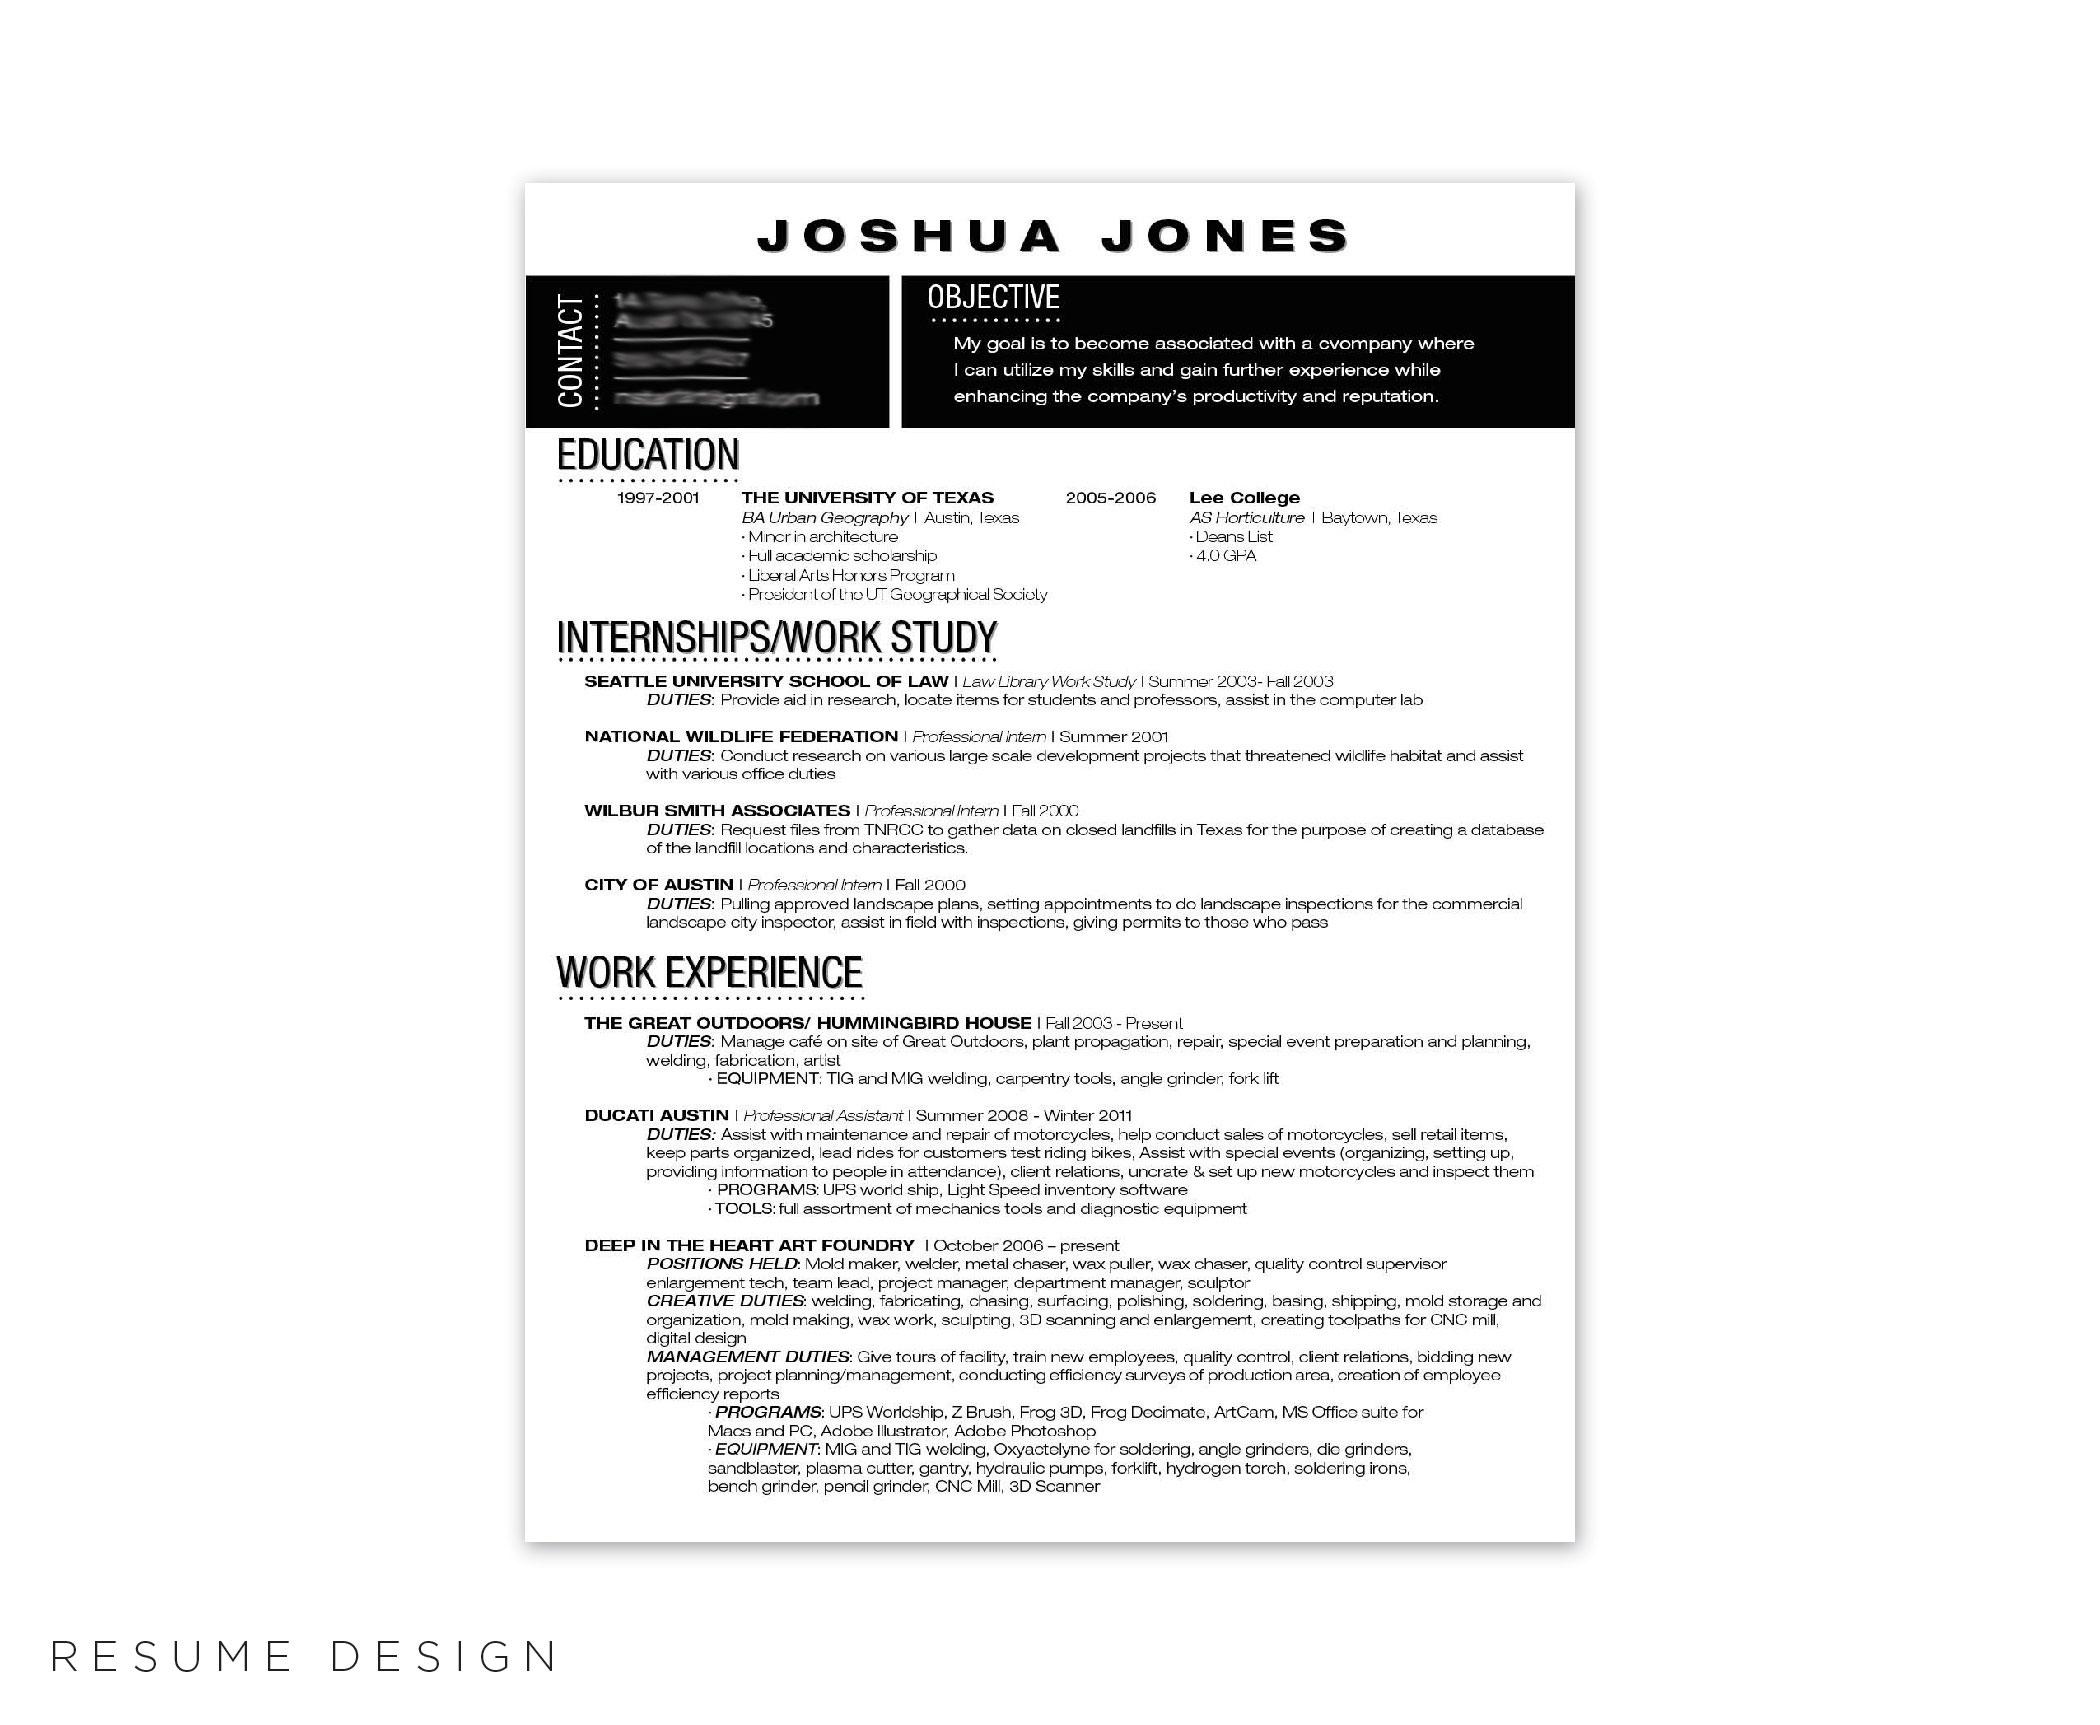 josh_resume-01.jpg